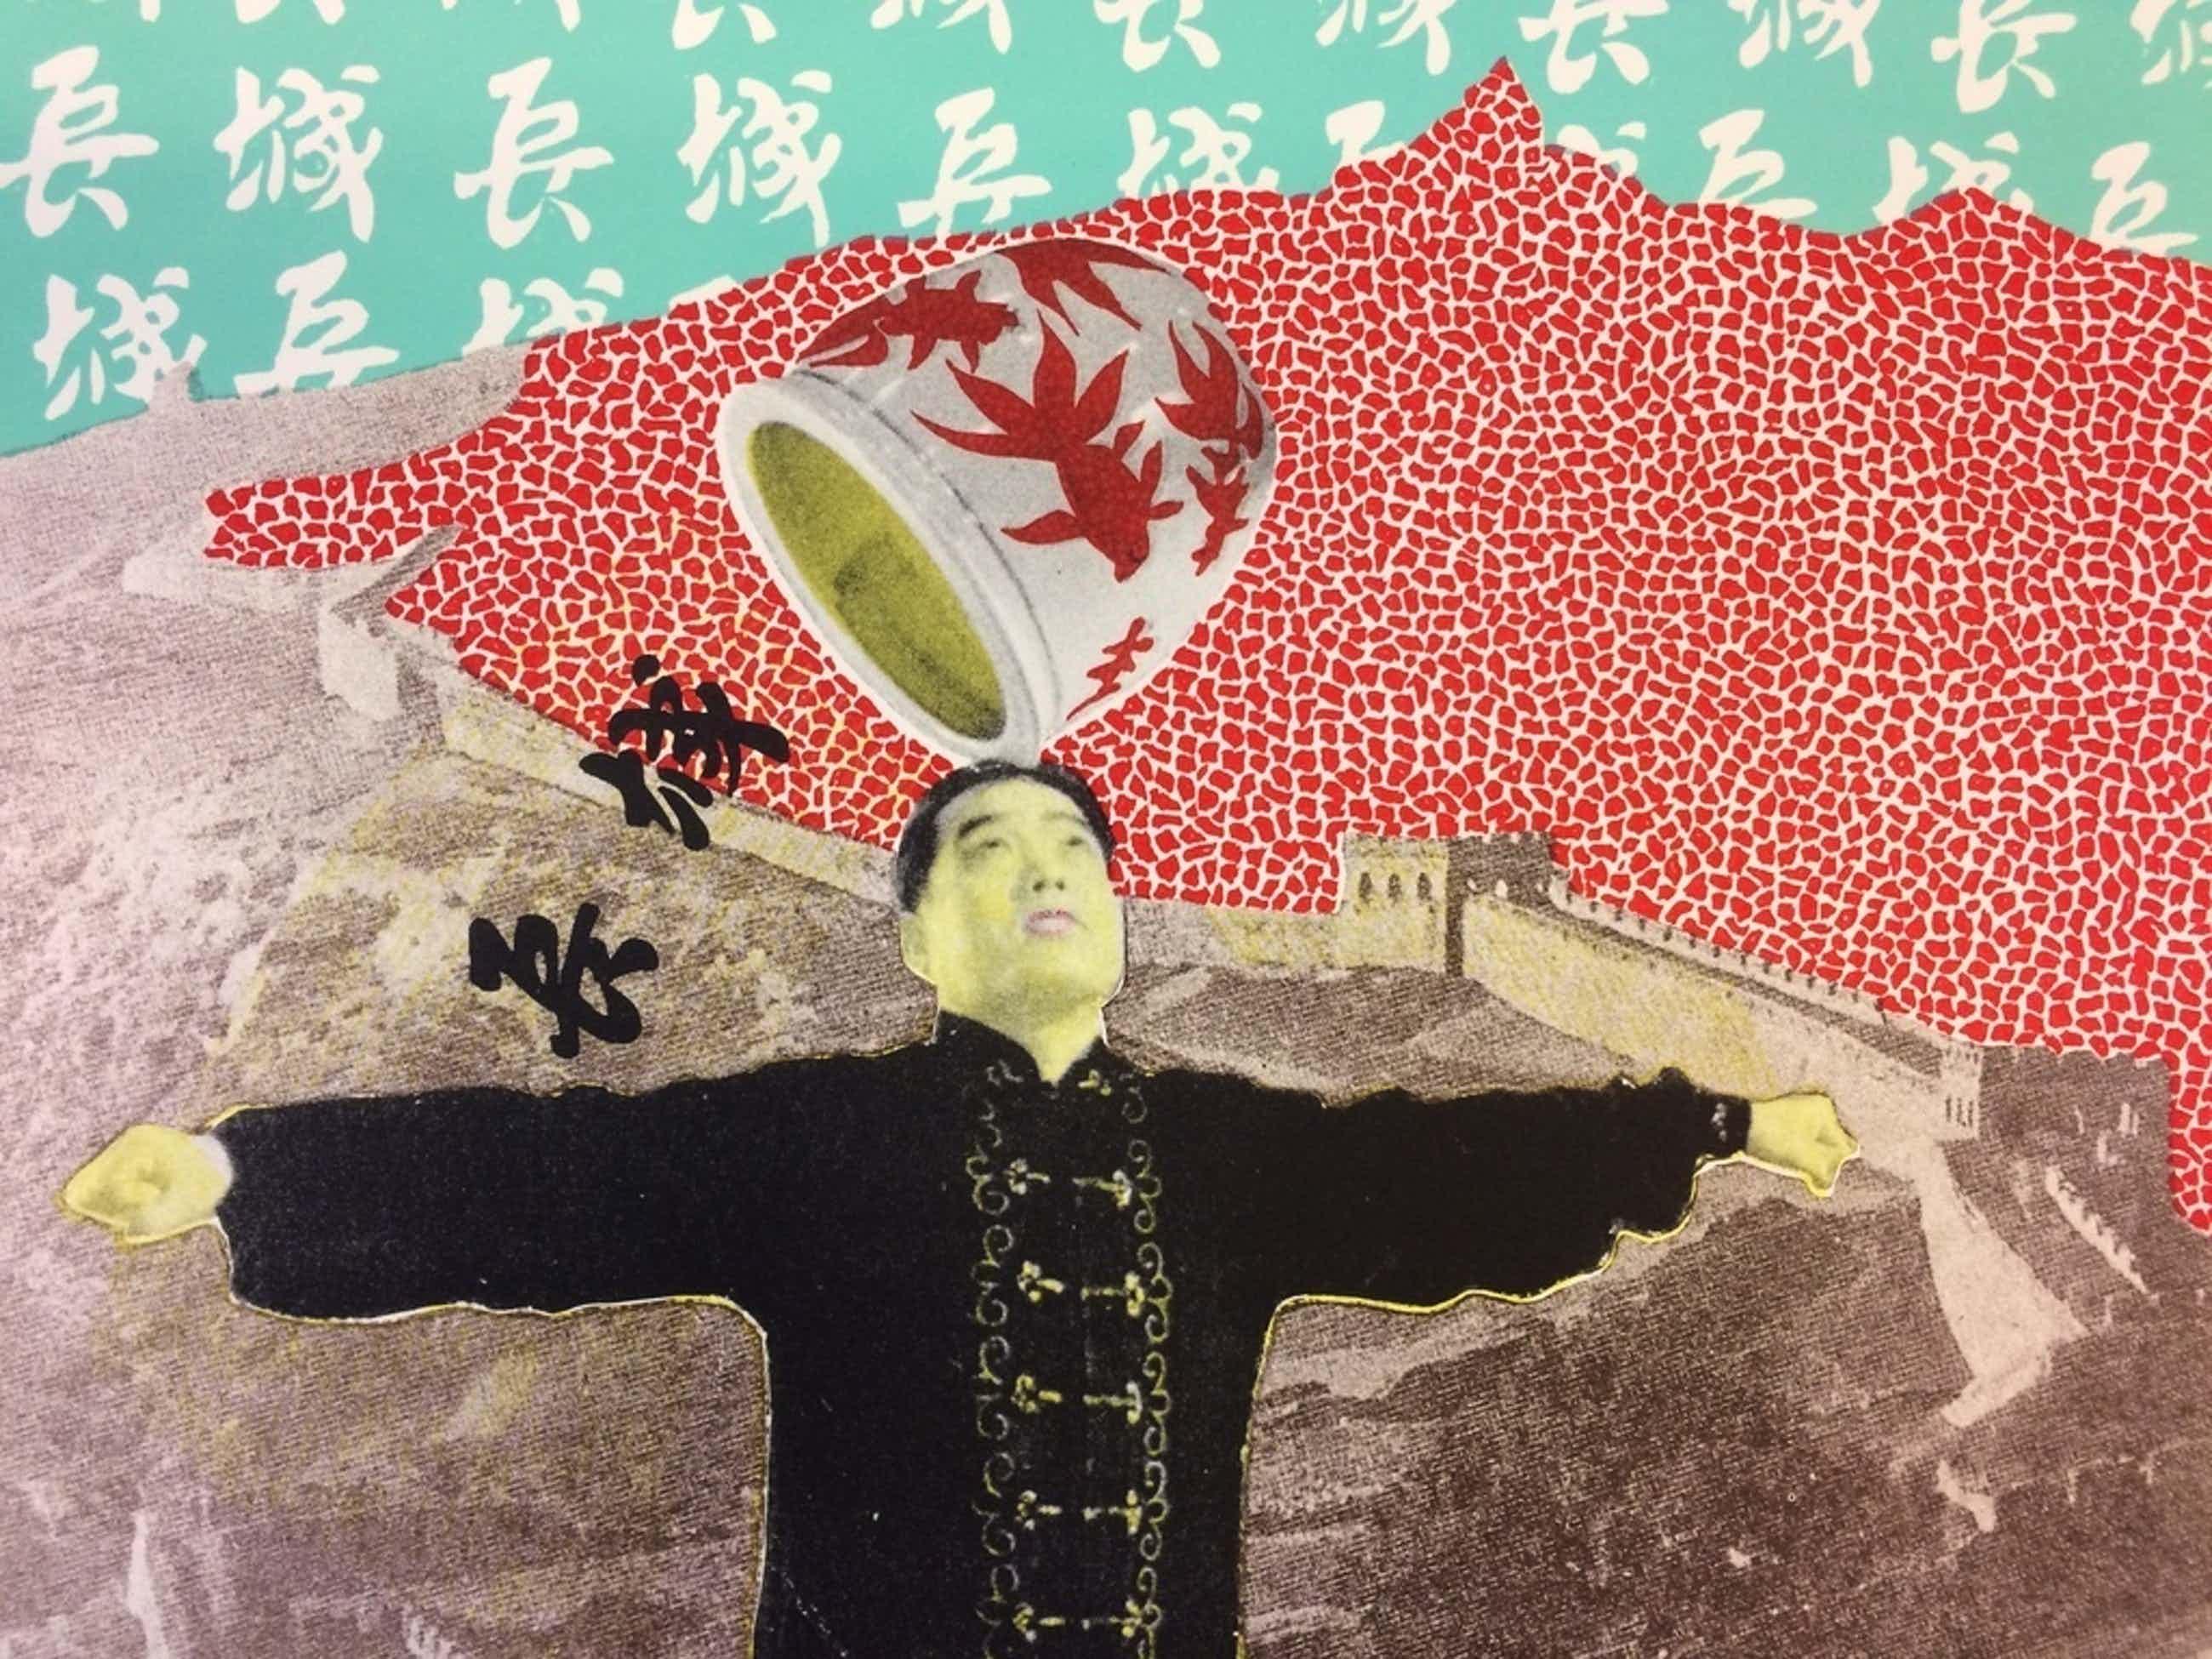 Woody van Amen, Chinese Muur, litho uit 1981 in perfecte staat 32/50 kopen? Bied vanaf 145!